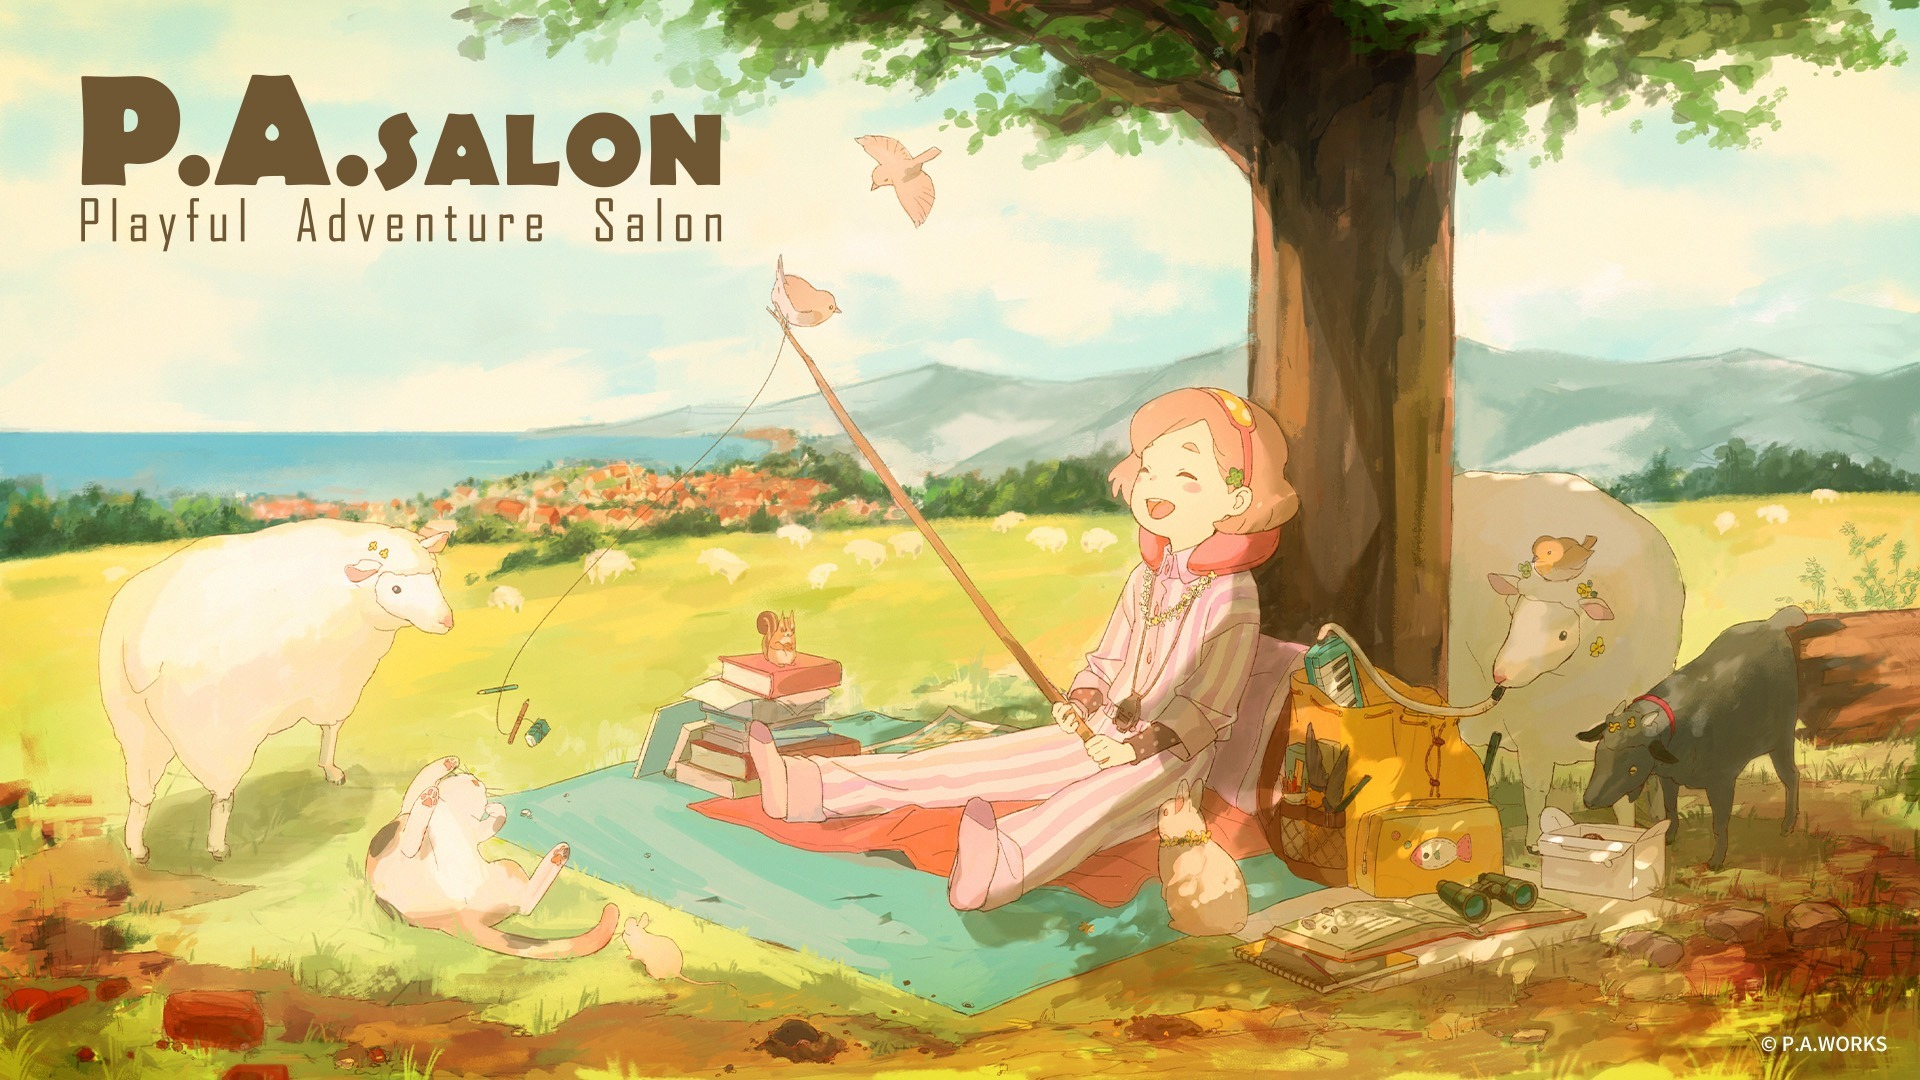 P.A.SALON